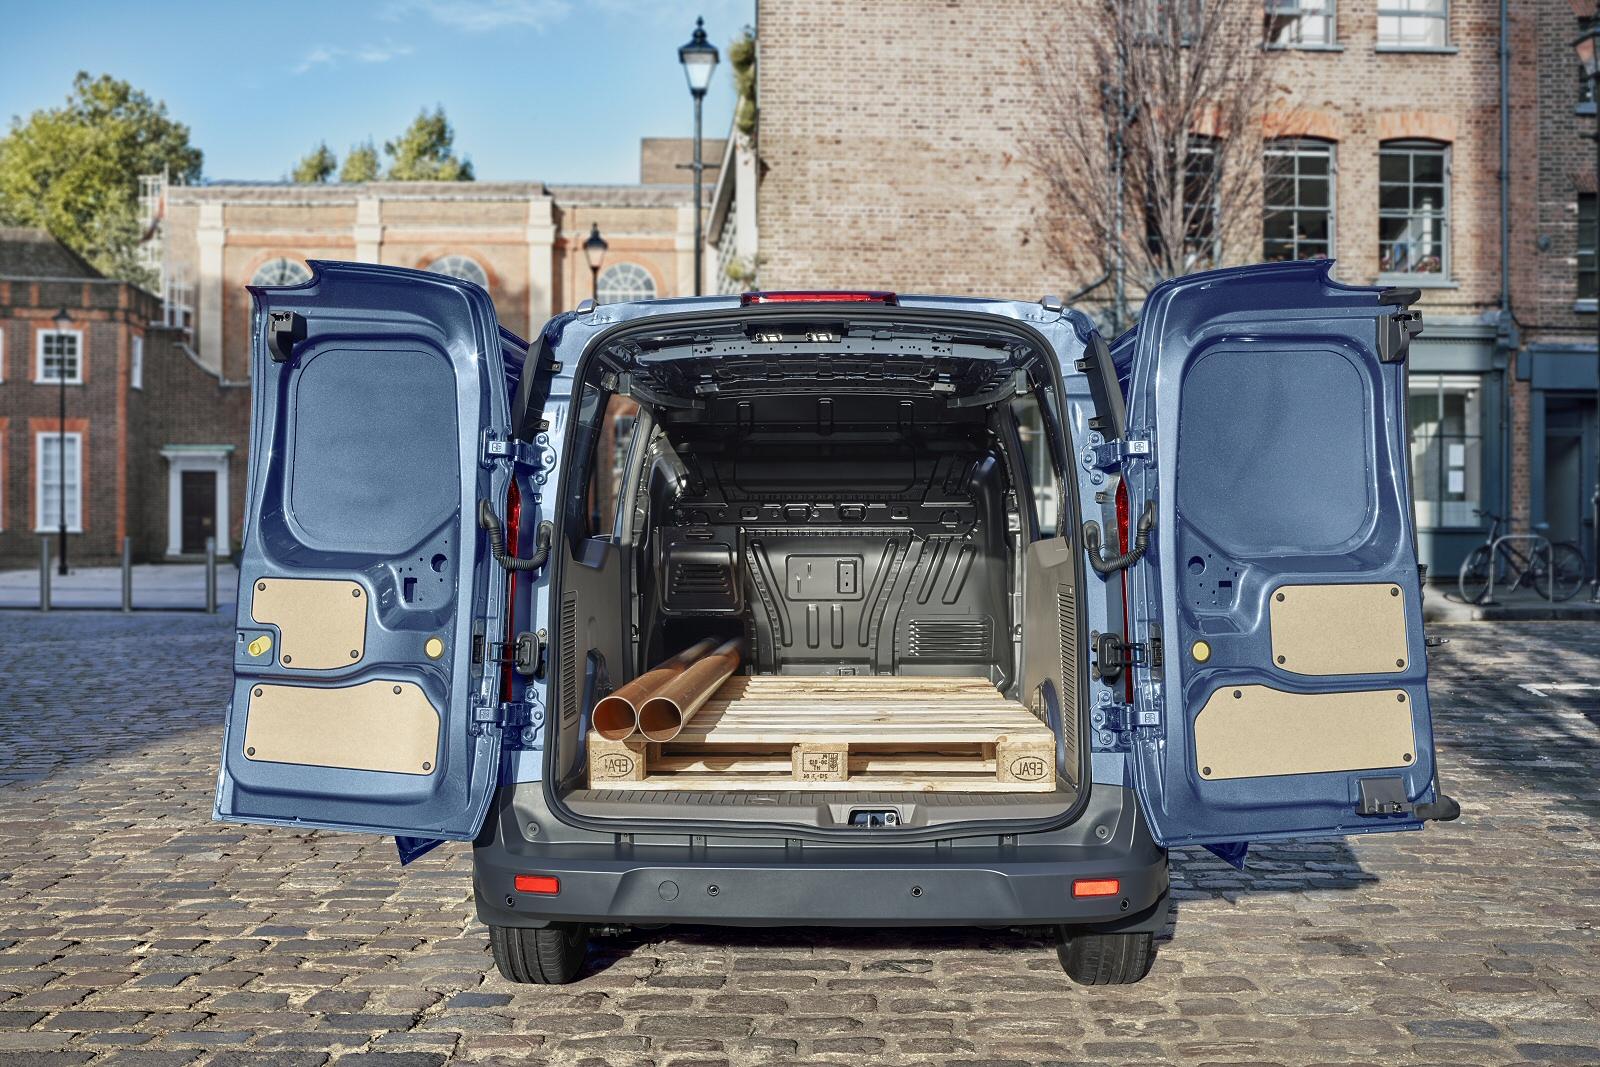 FORD TRANSIT CONNECT 220 L1 DIESEL 1.5 EcoBlue 100ps Trend D/Cab Van